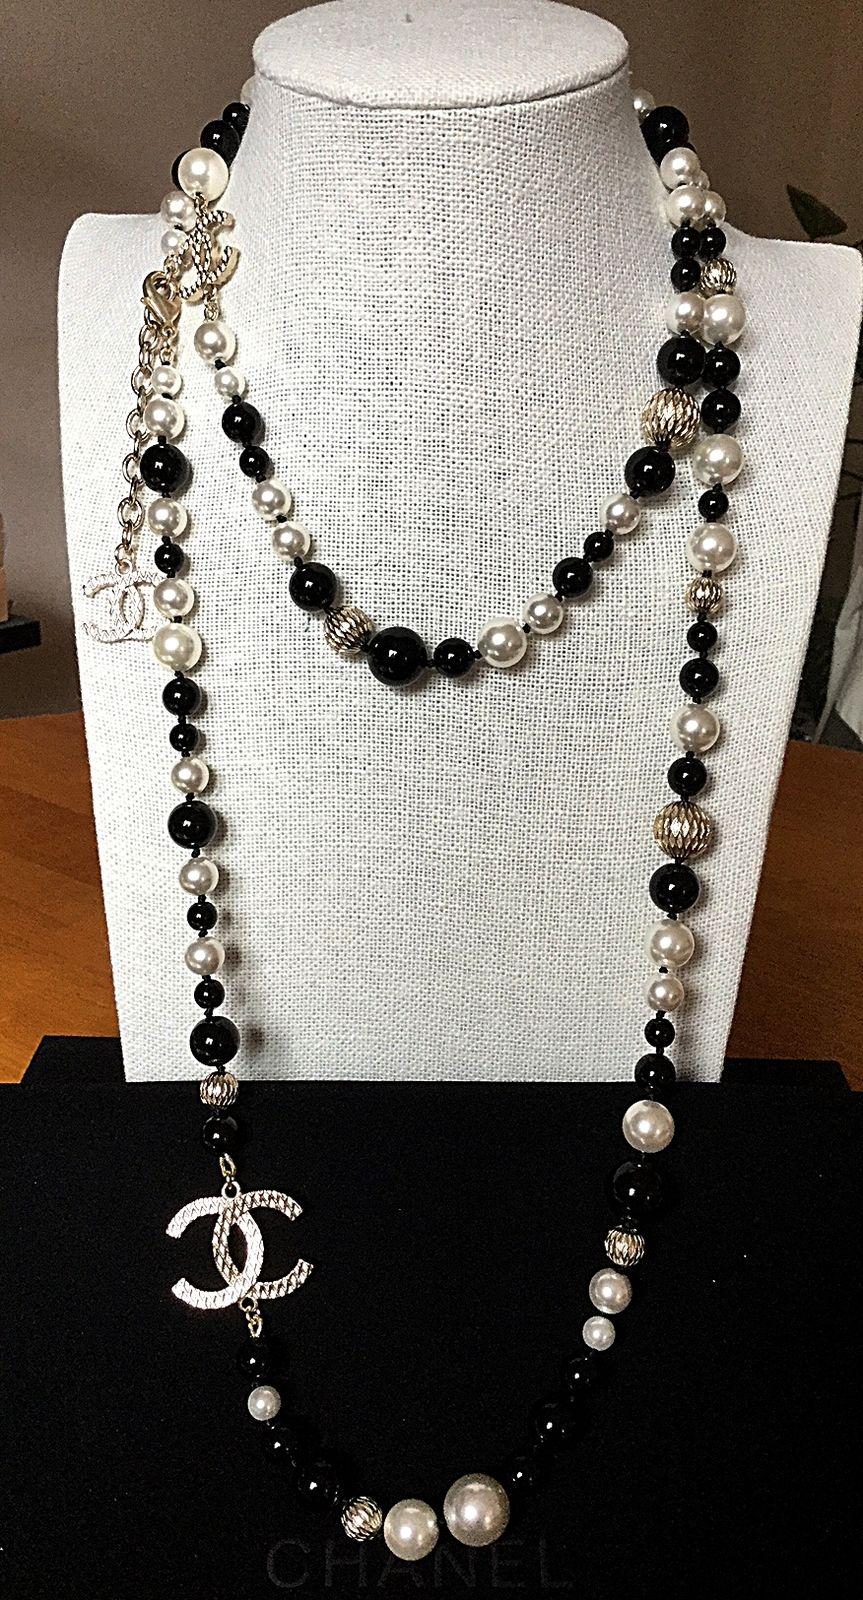 4e4ce1c4fe0bd CHANEL Black White Pearl Long Strand Necklace CC Gold Metal Ball Chain 44